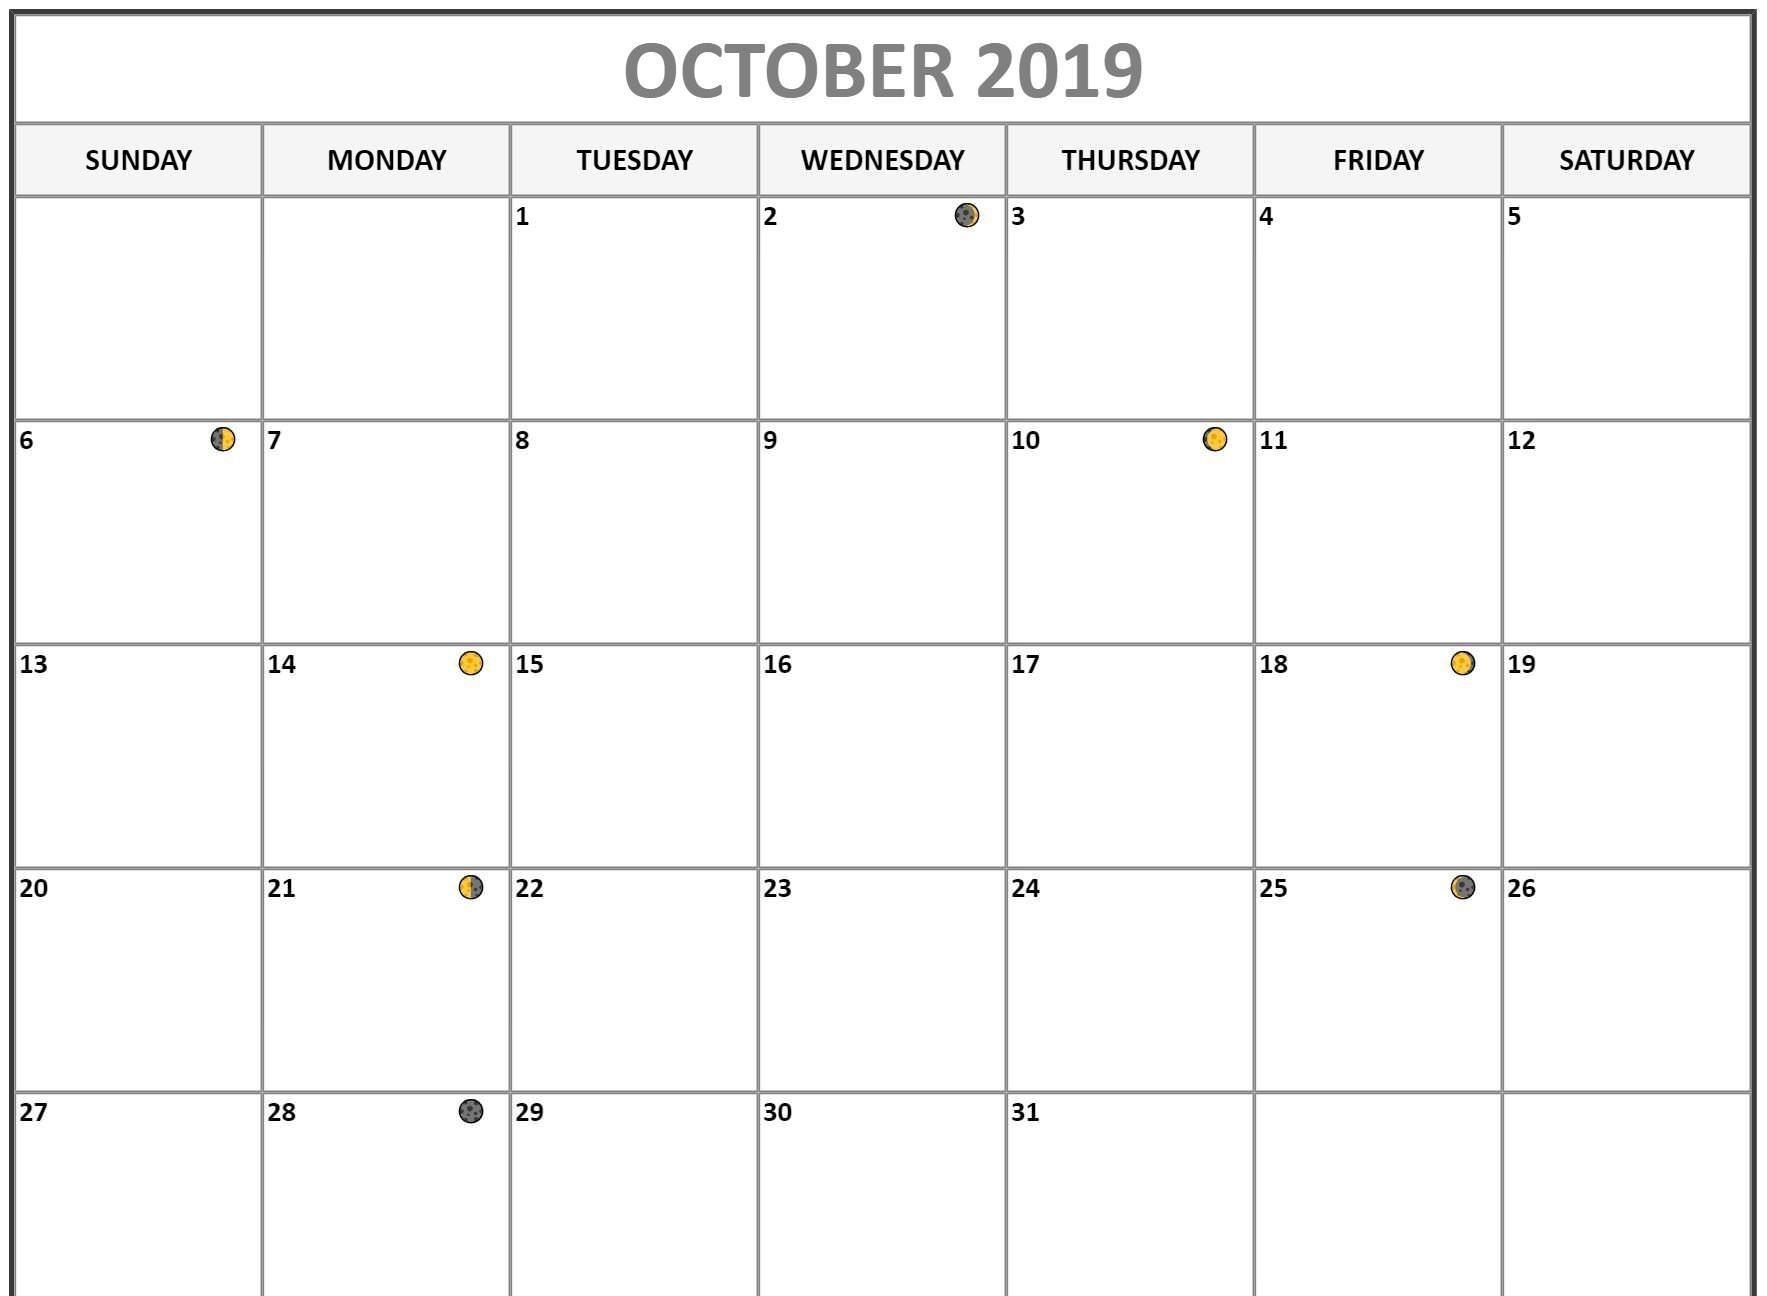 October 2019 Calendar Moon Phases Moon Calendar Lunar Calendar